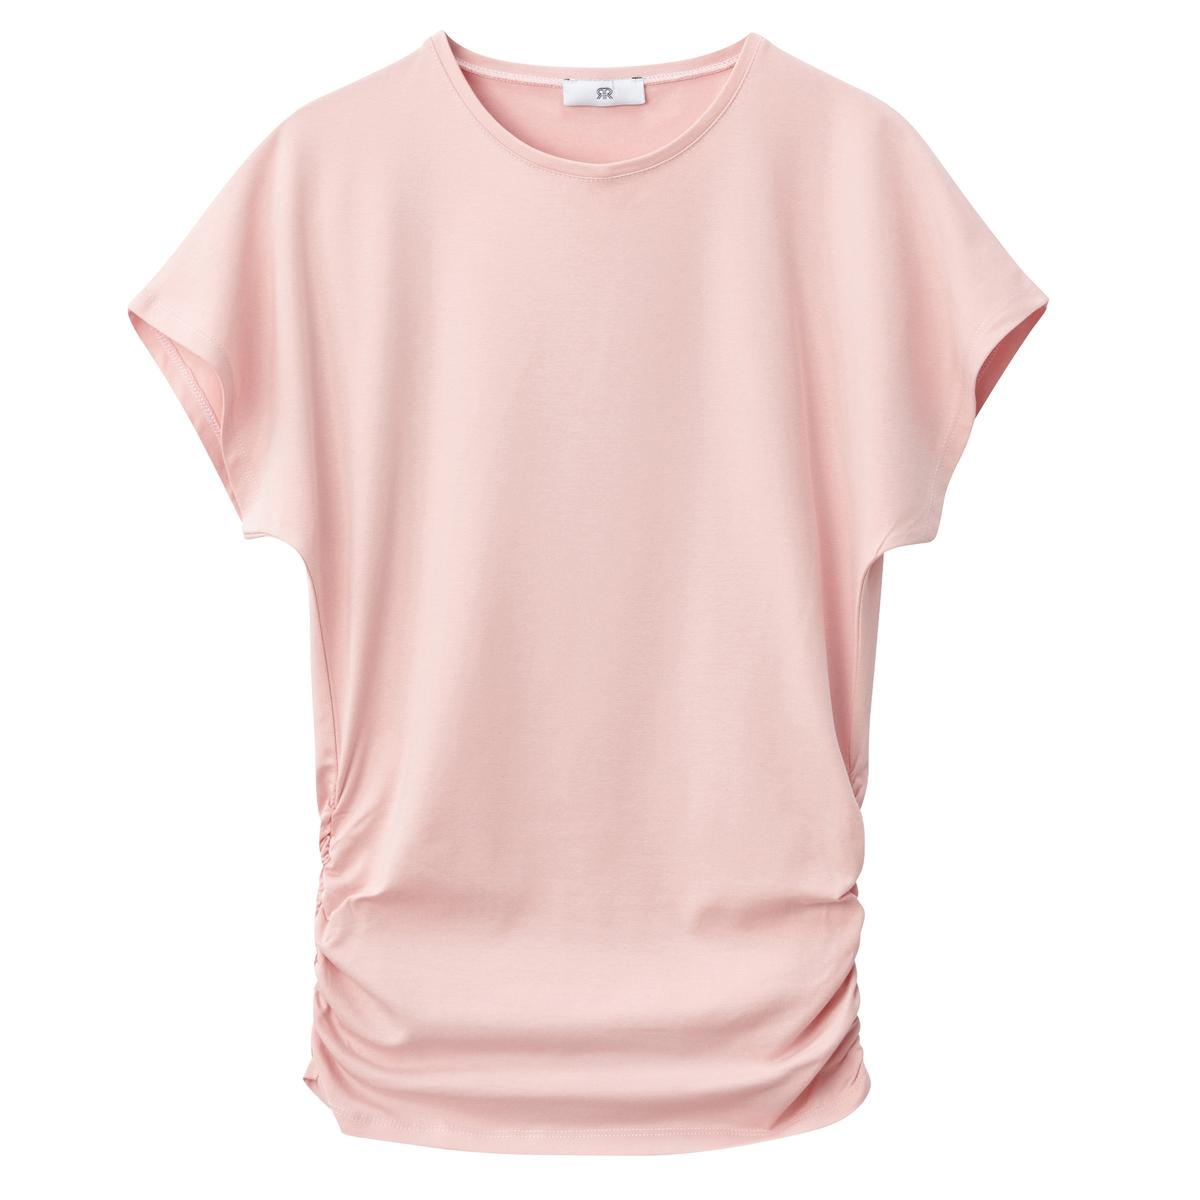 T-shirt plissada dos lados, gola redonda, mangas curtas